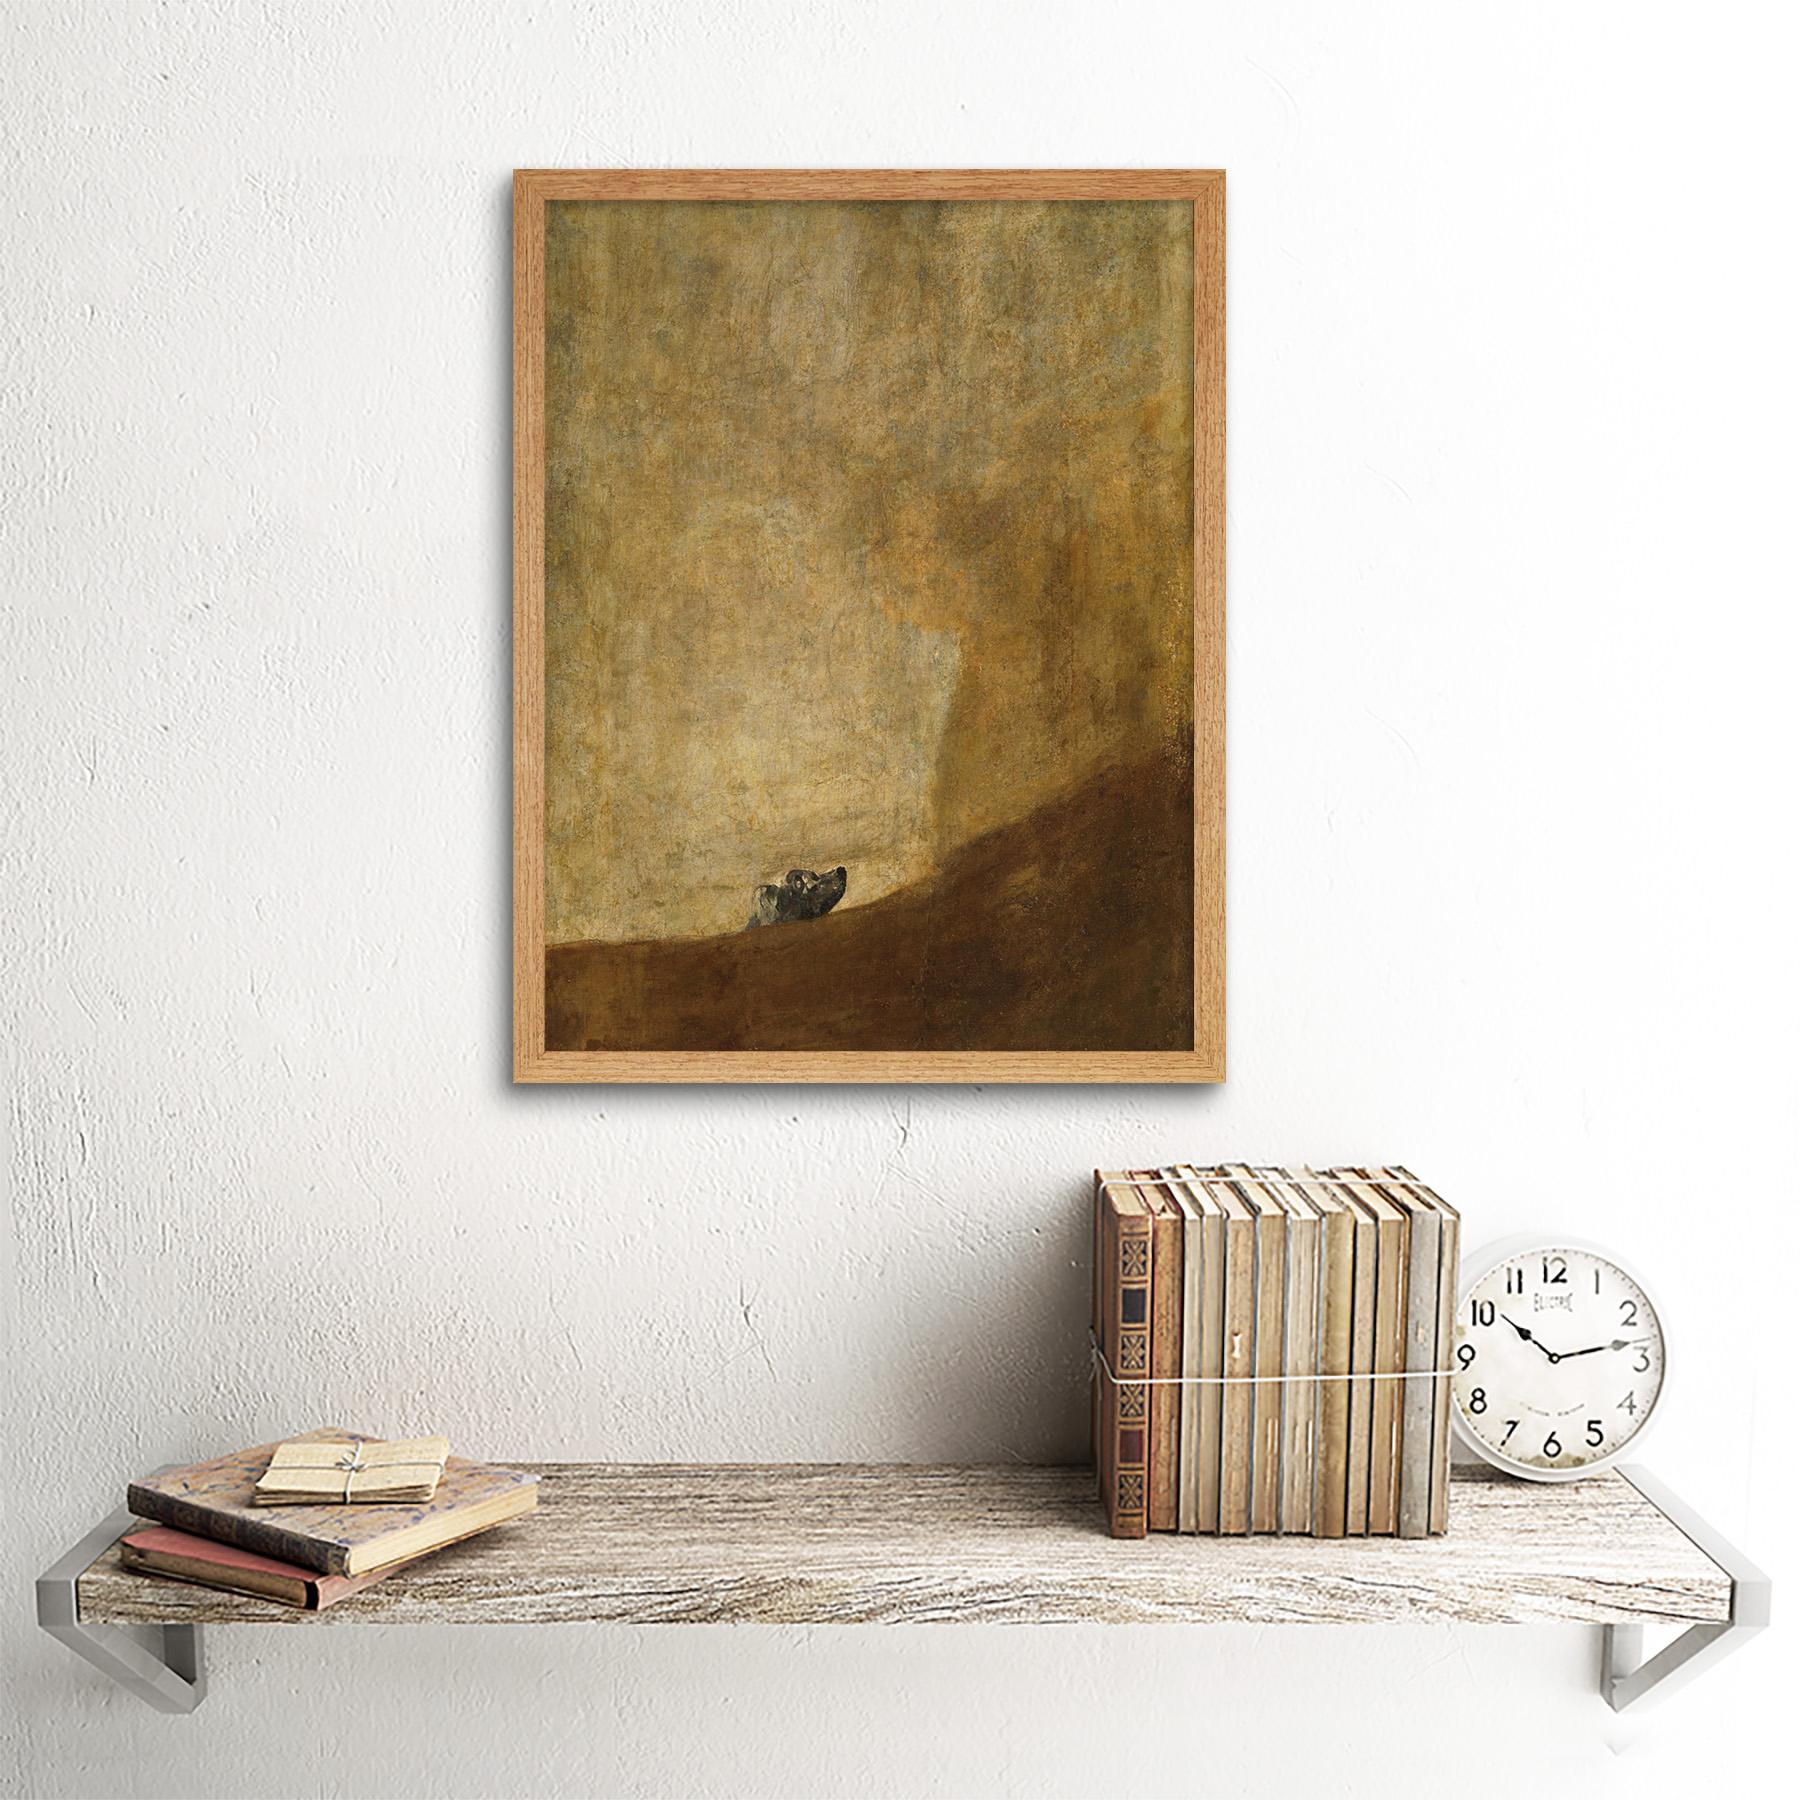 Goya-Dog-Painting-Wall-Art-Print-Framed-12x16 thumbnail 13